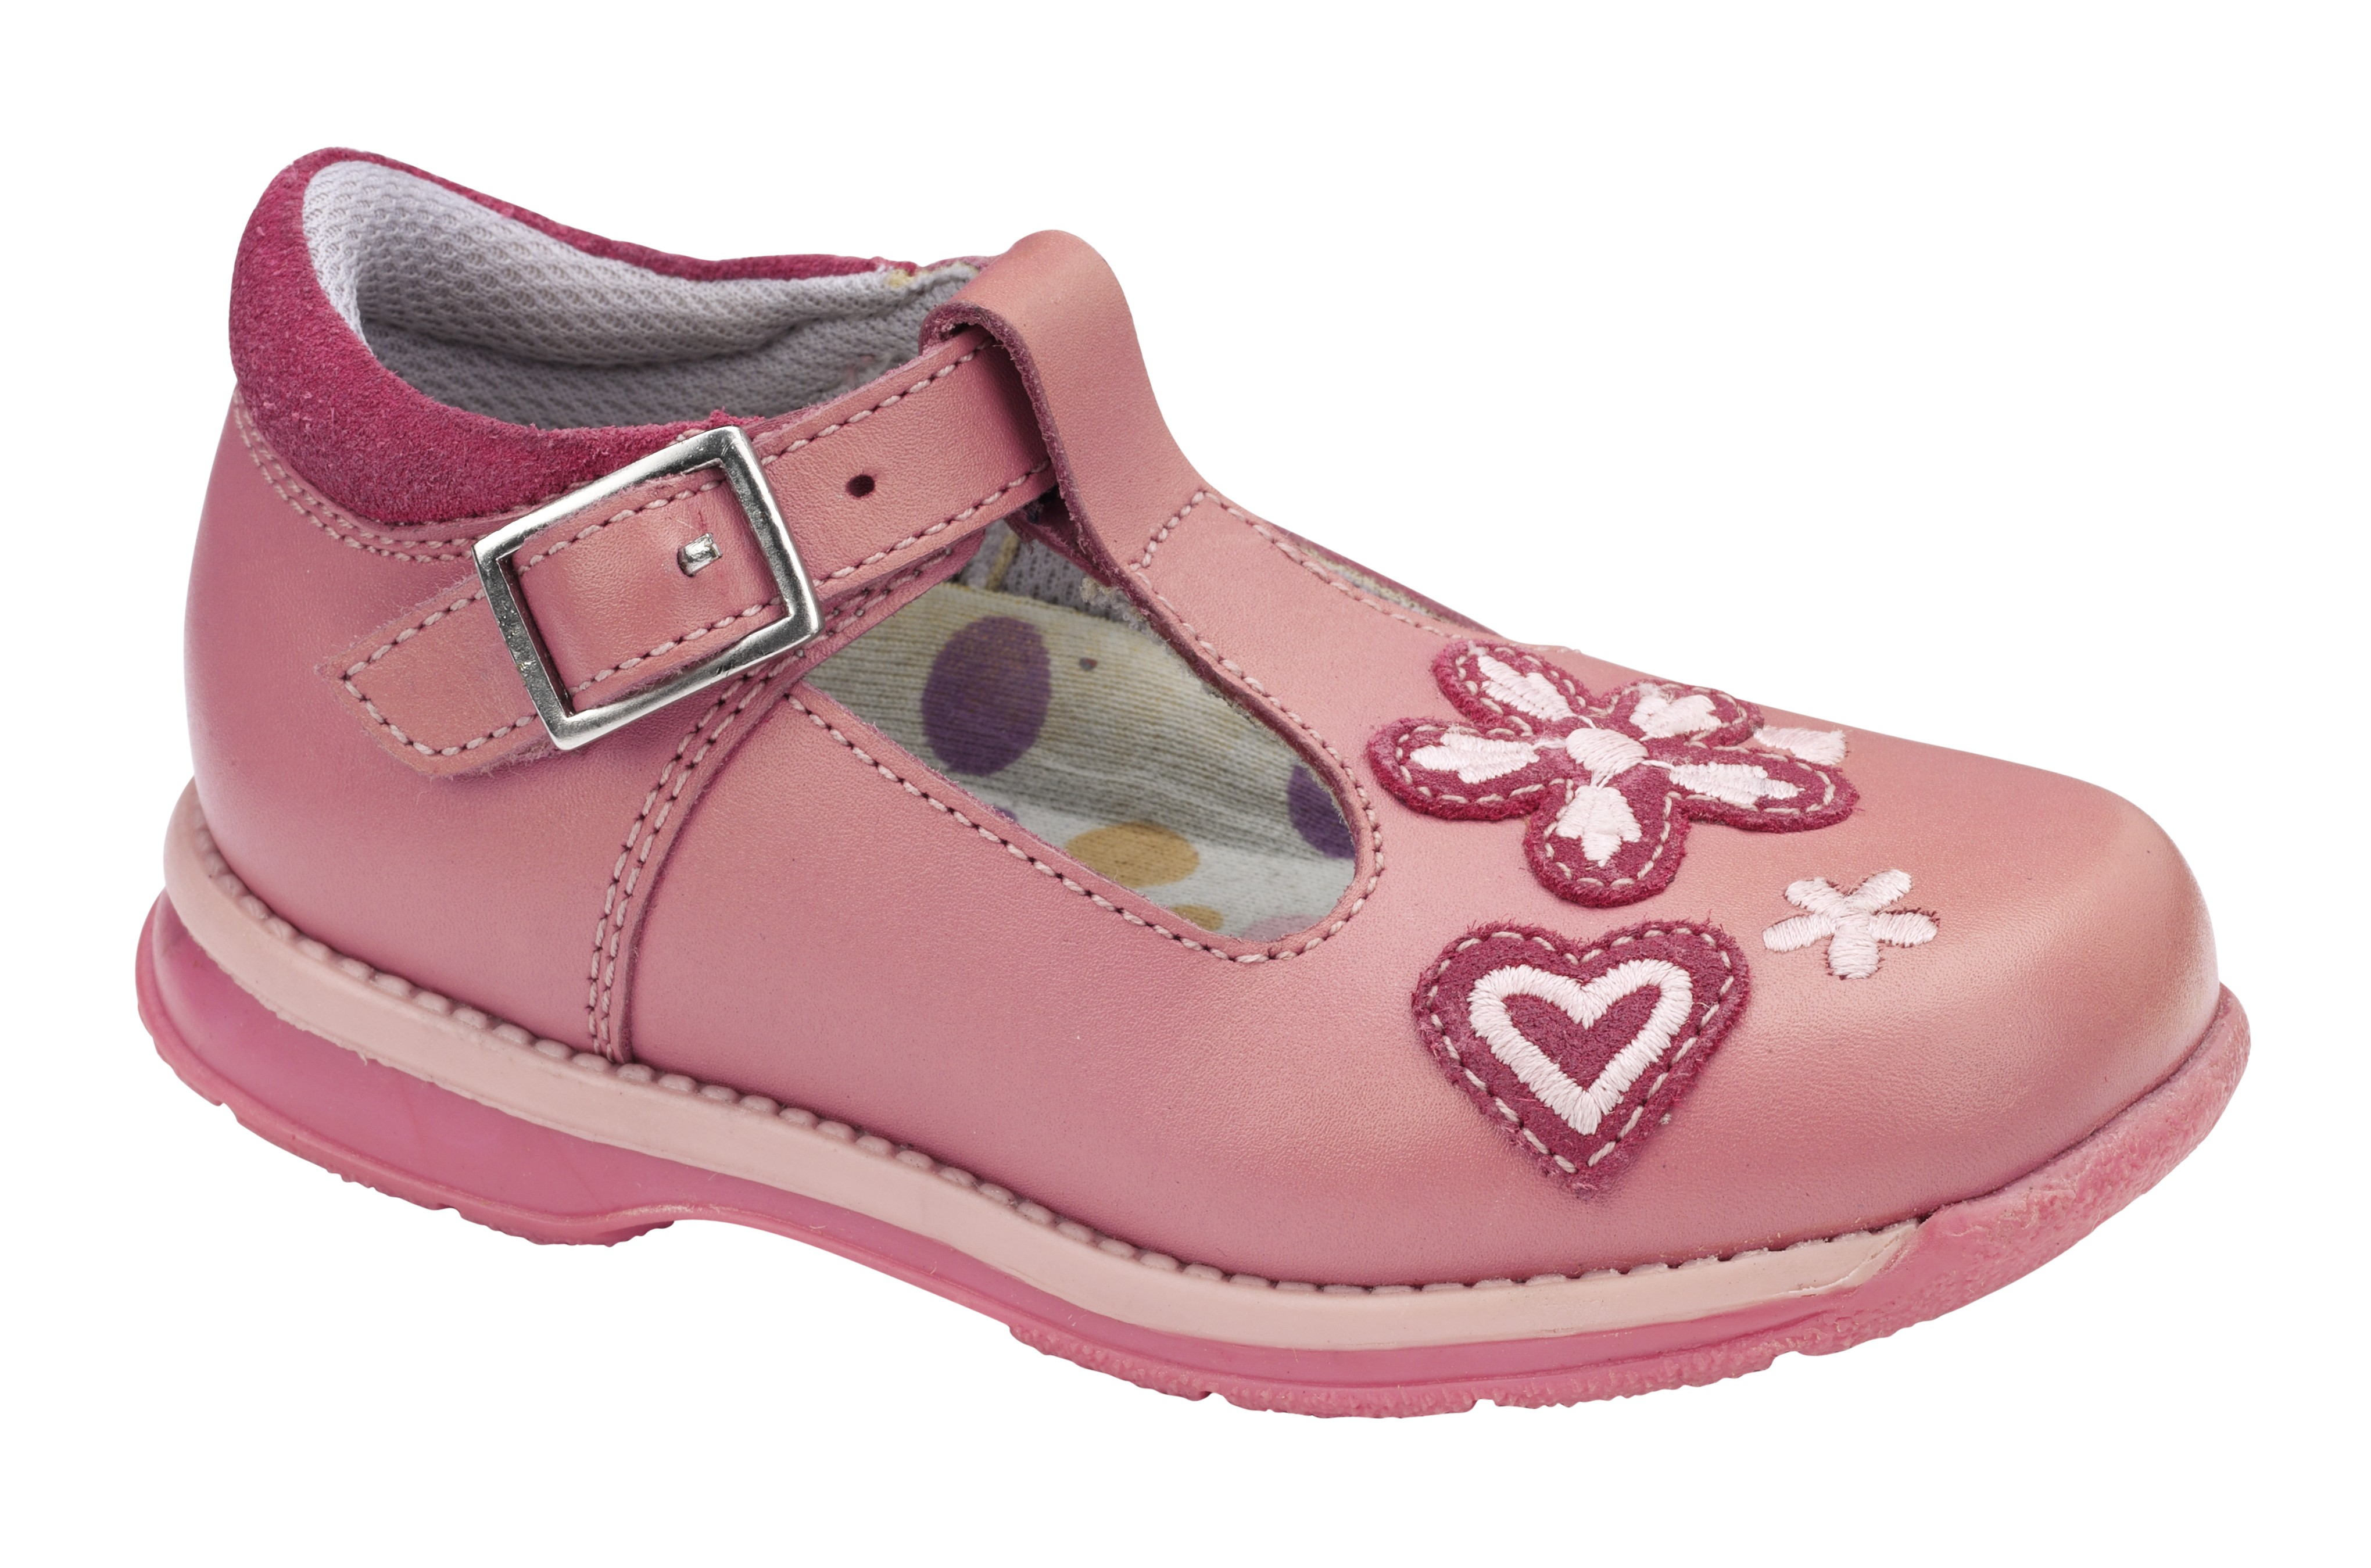 hush puppies helene pink t bar shoes wanderers